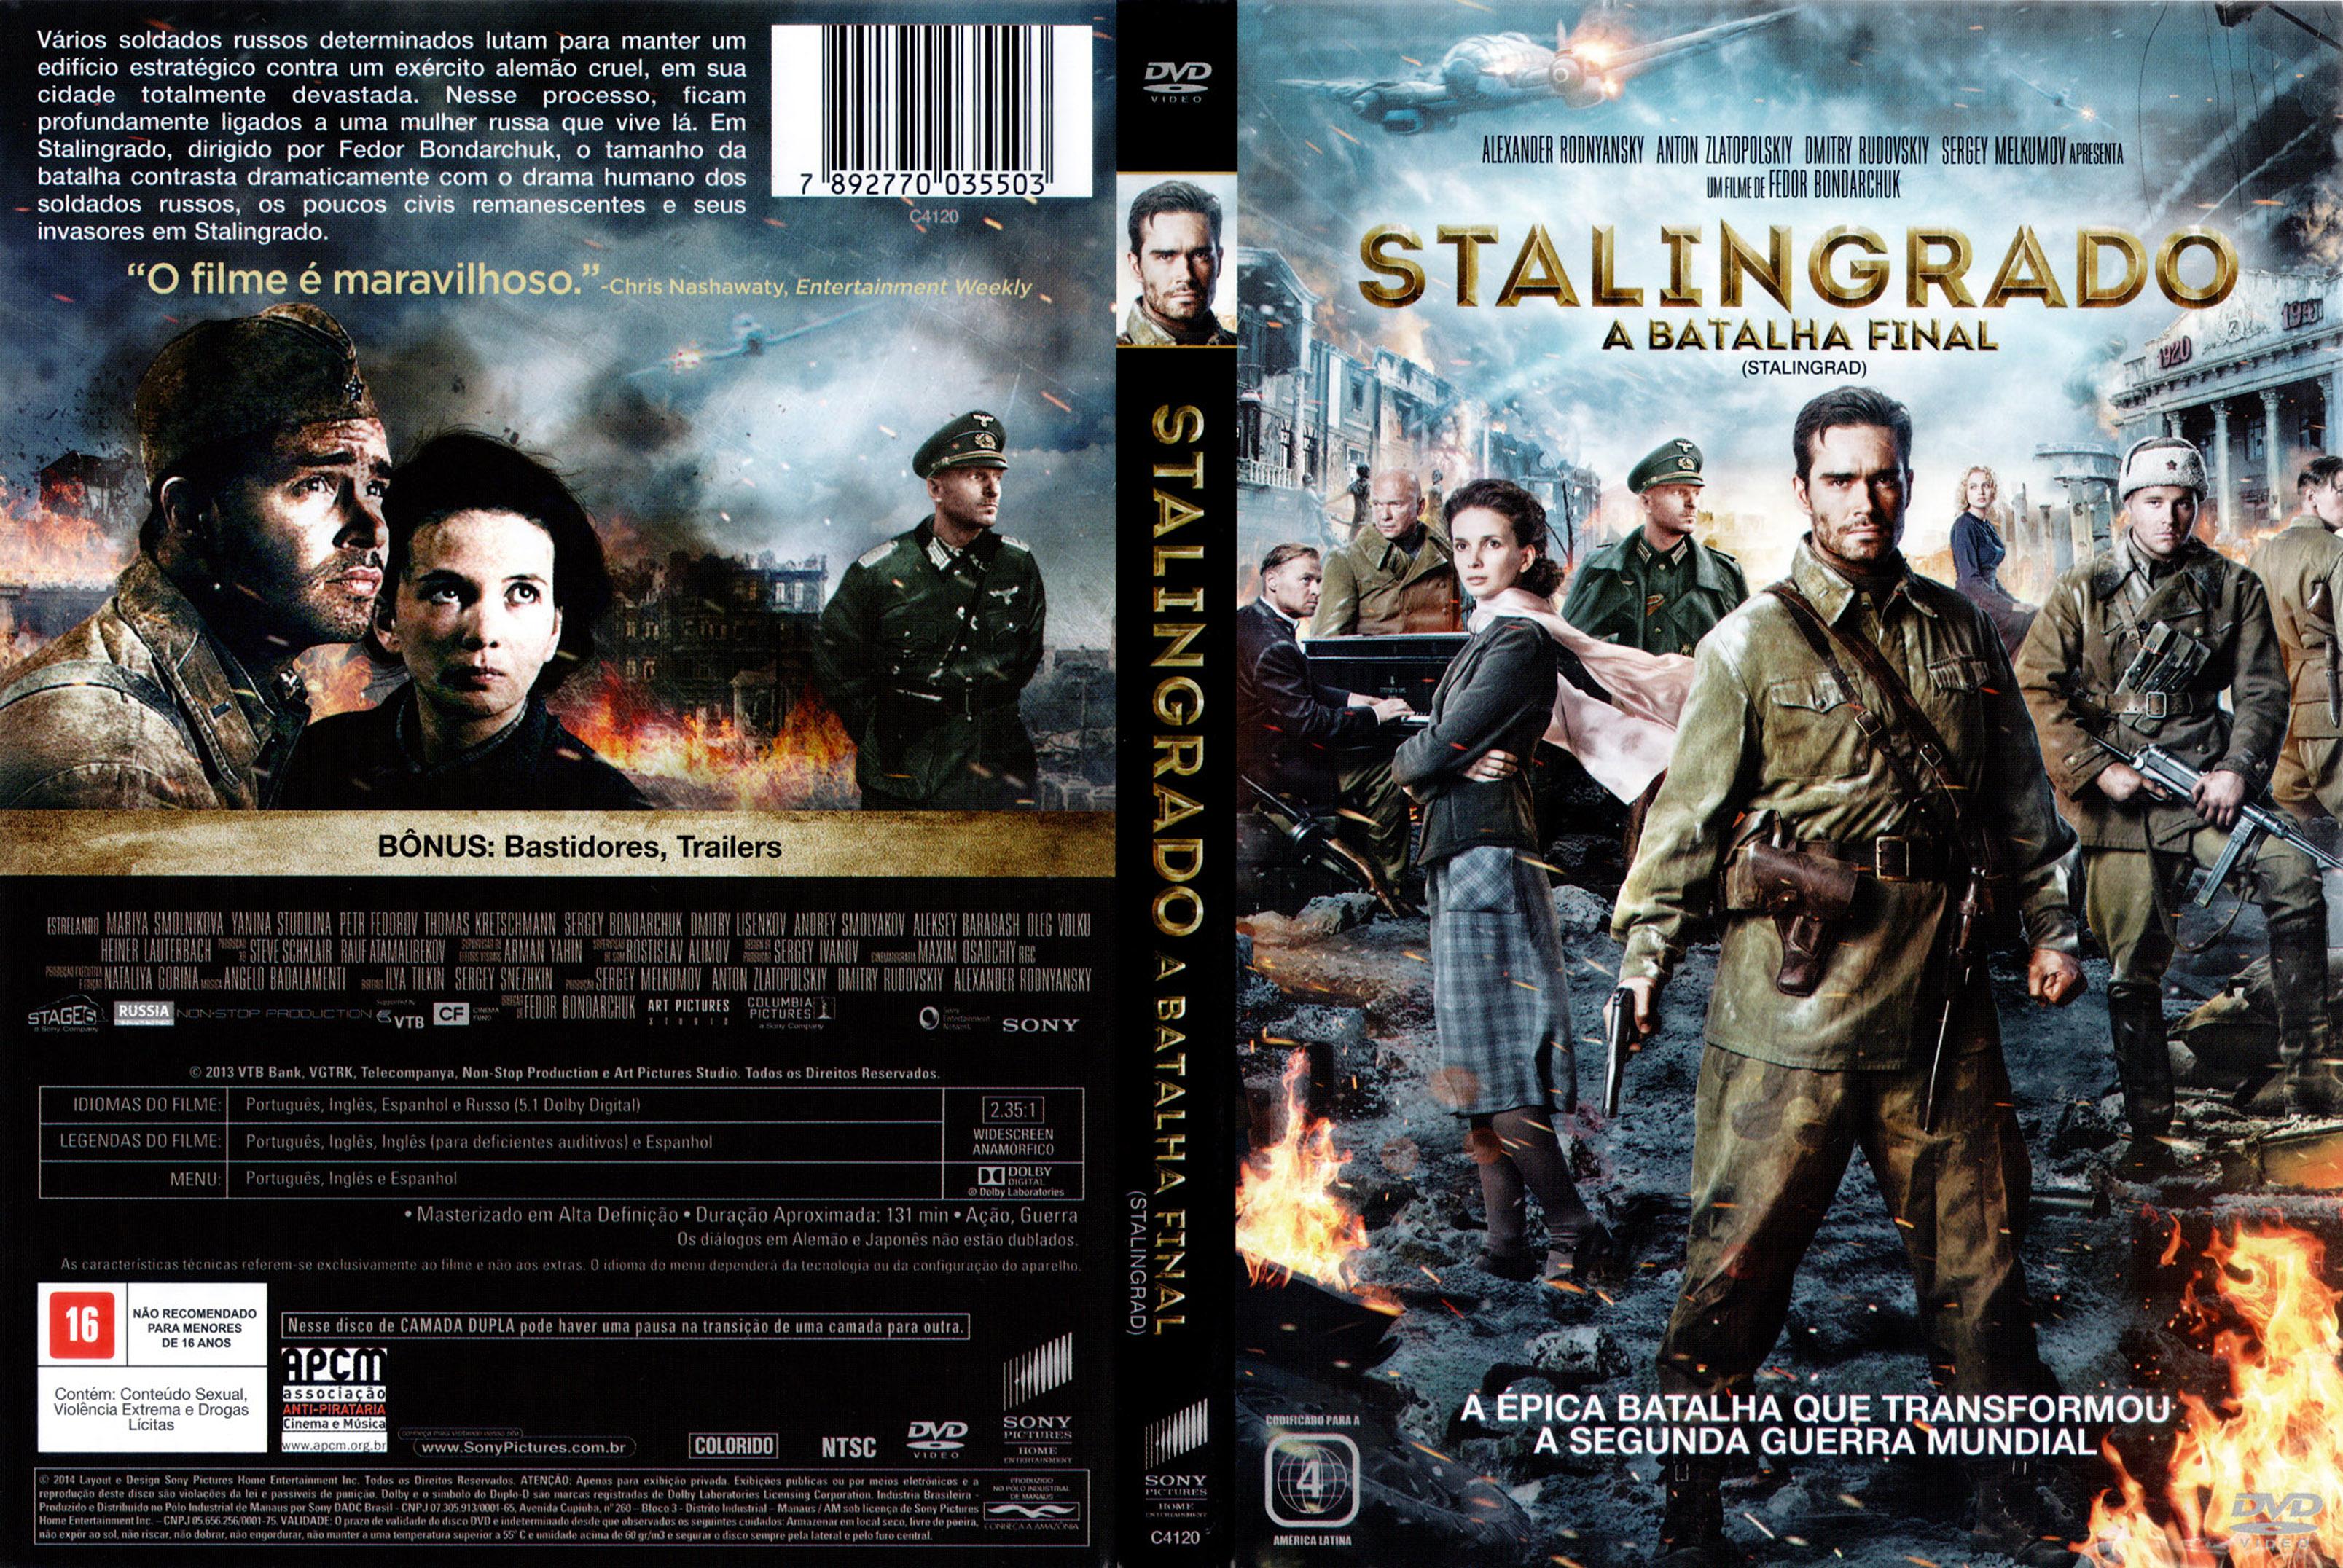 StalingradoABatalhaFinal